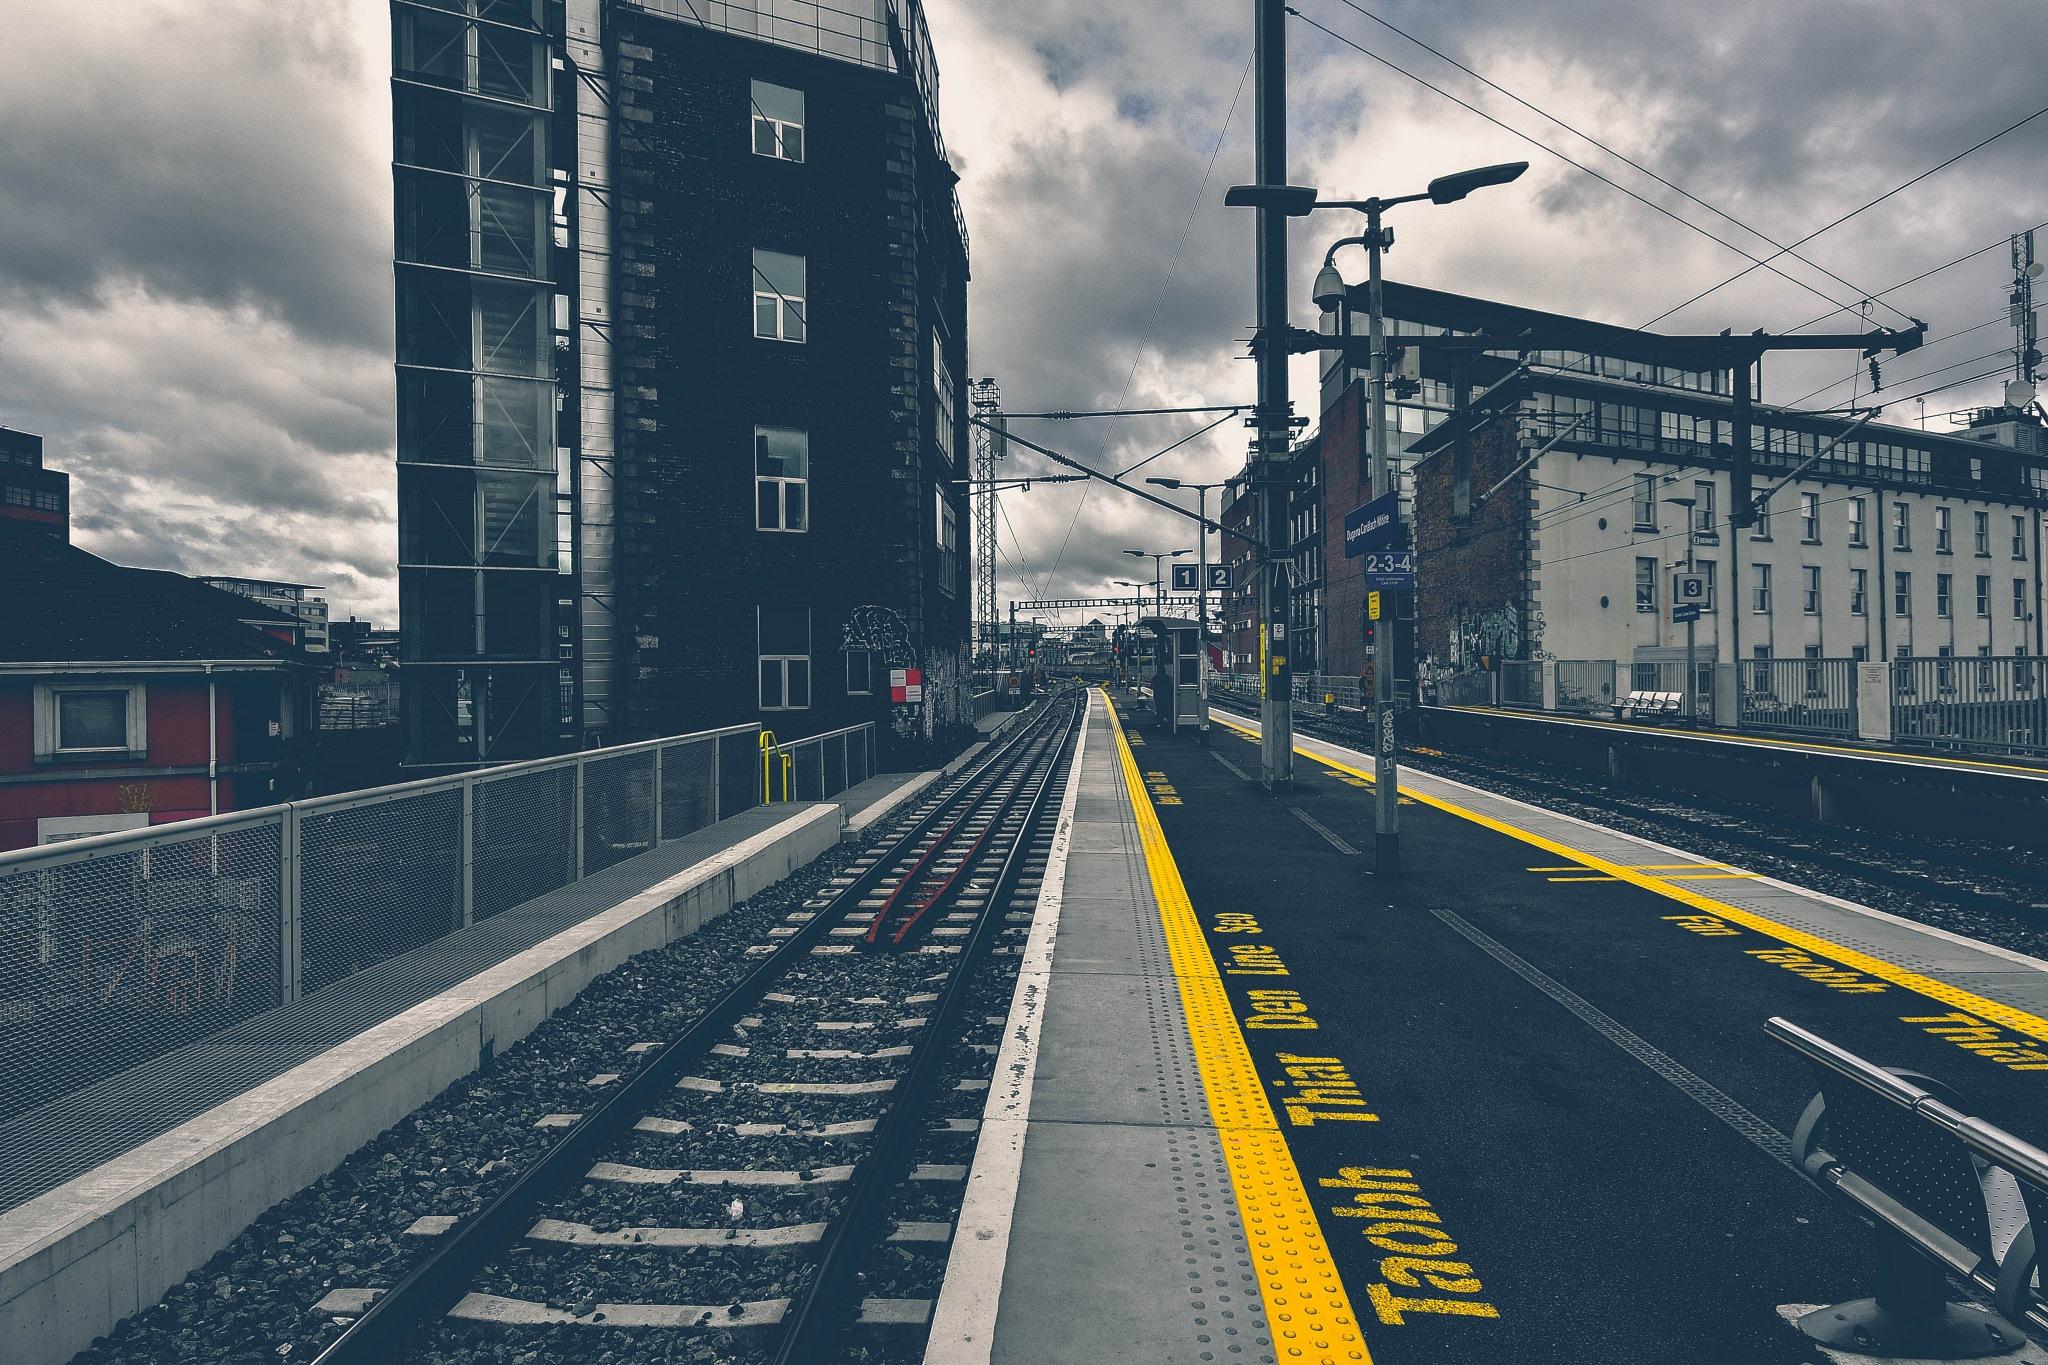 station by arthur.filip